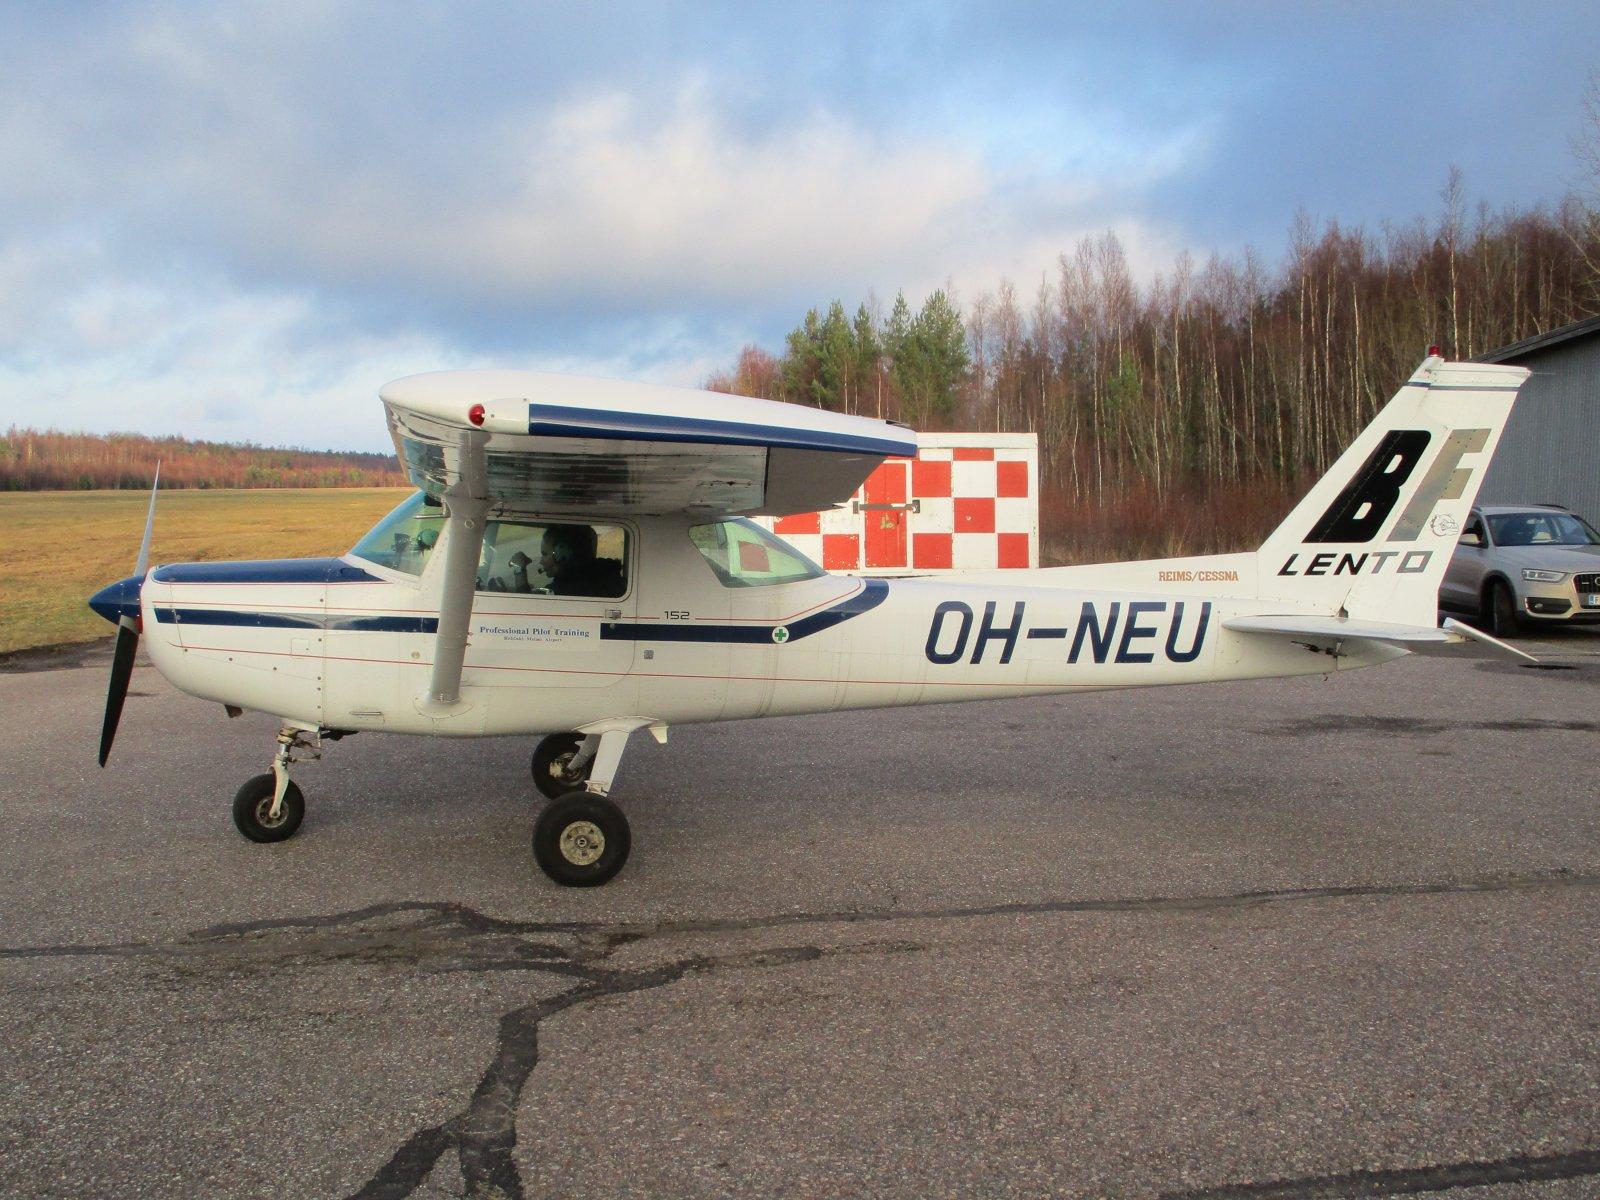 Reims/Cessna FA152 Aerobat OH-NEU EFHN 2018-11-17